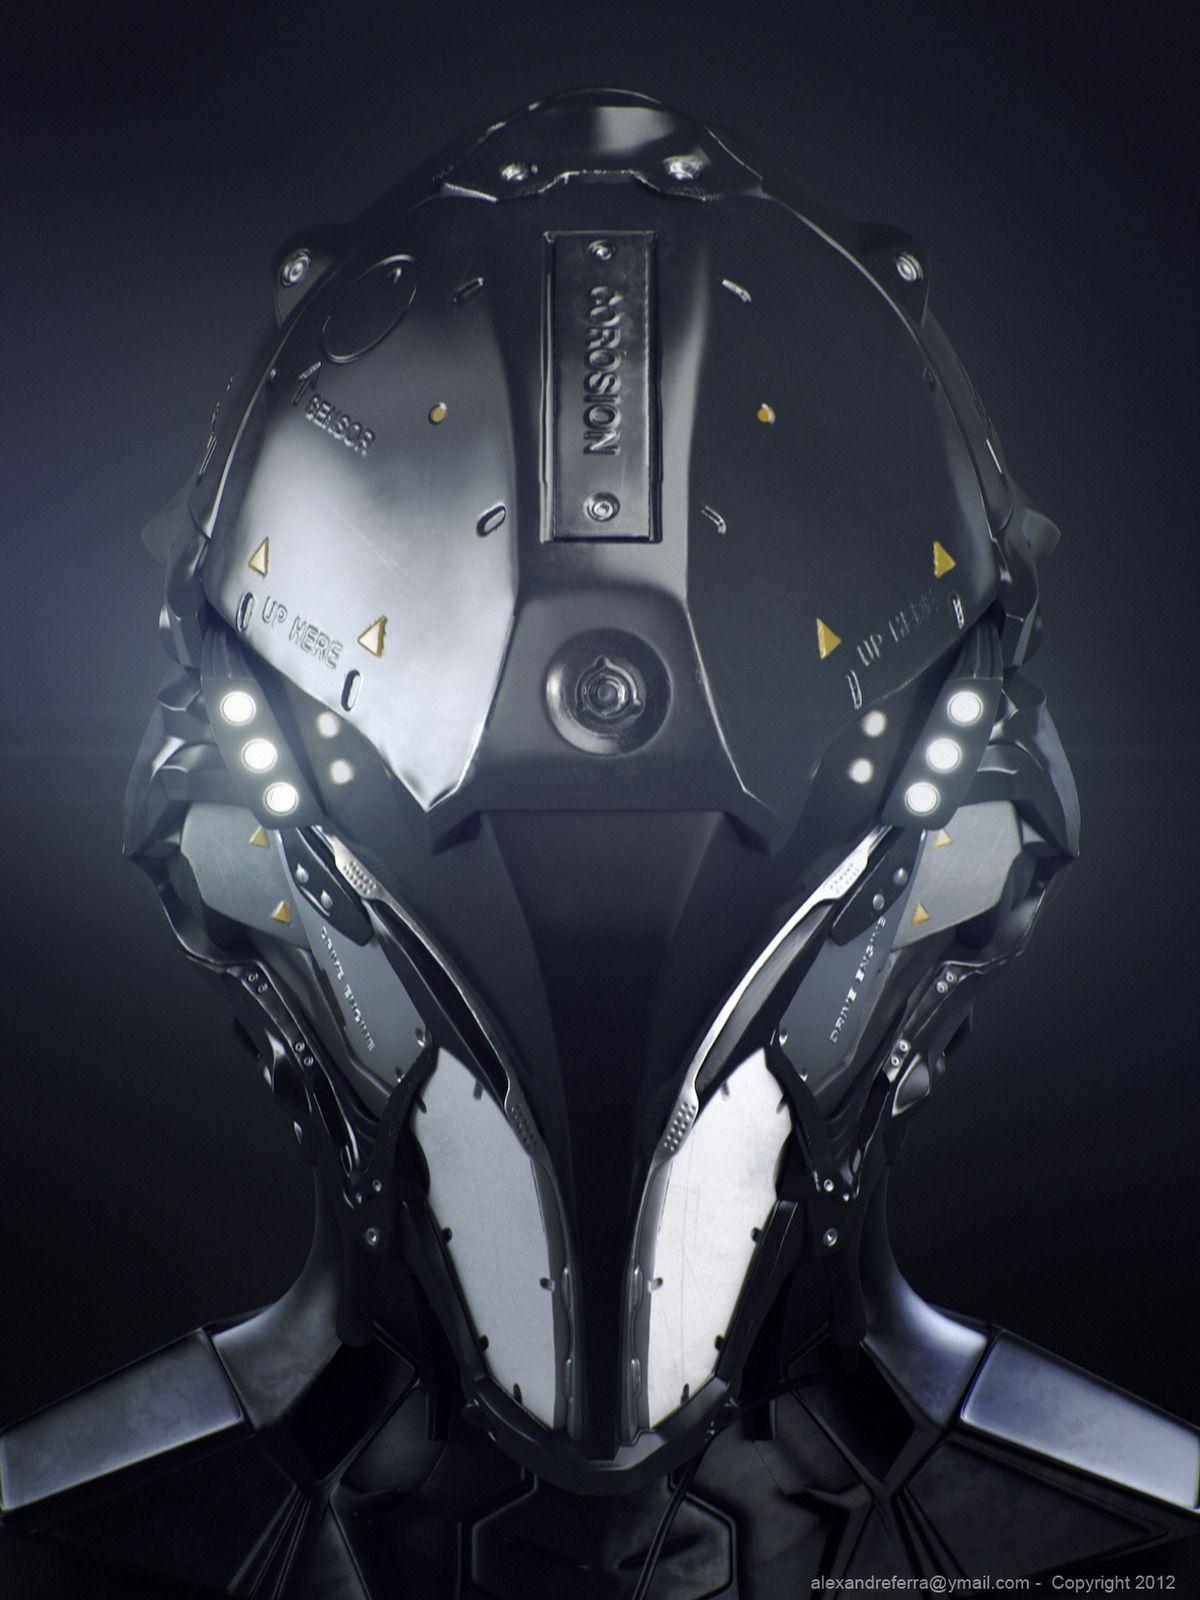 Space helmet picture 3d sci fi robot science fiction for Sci fi decor